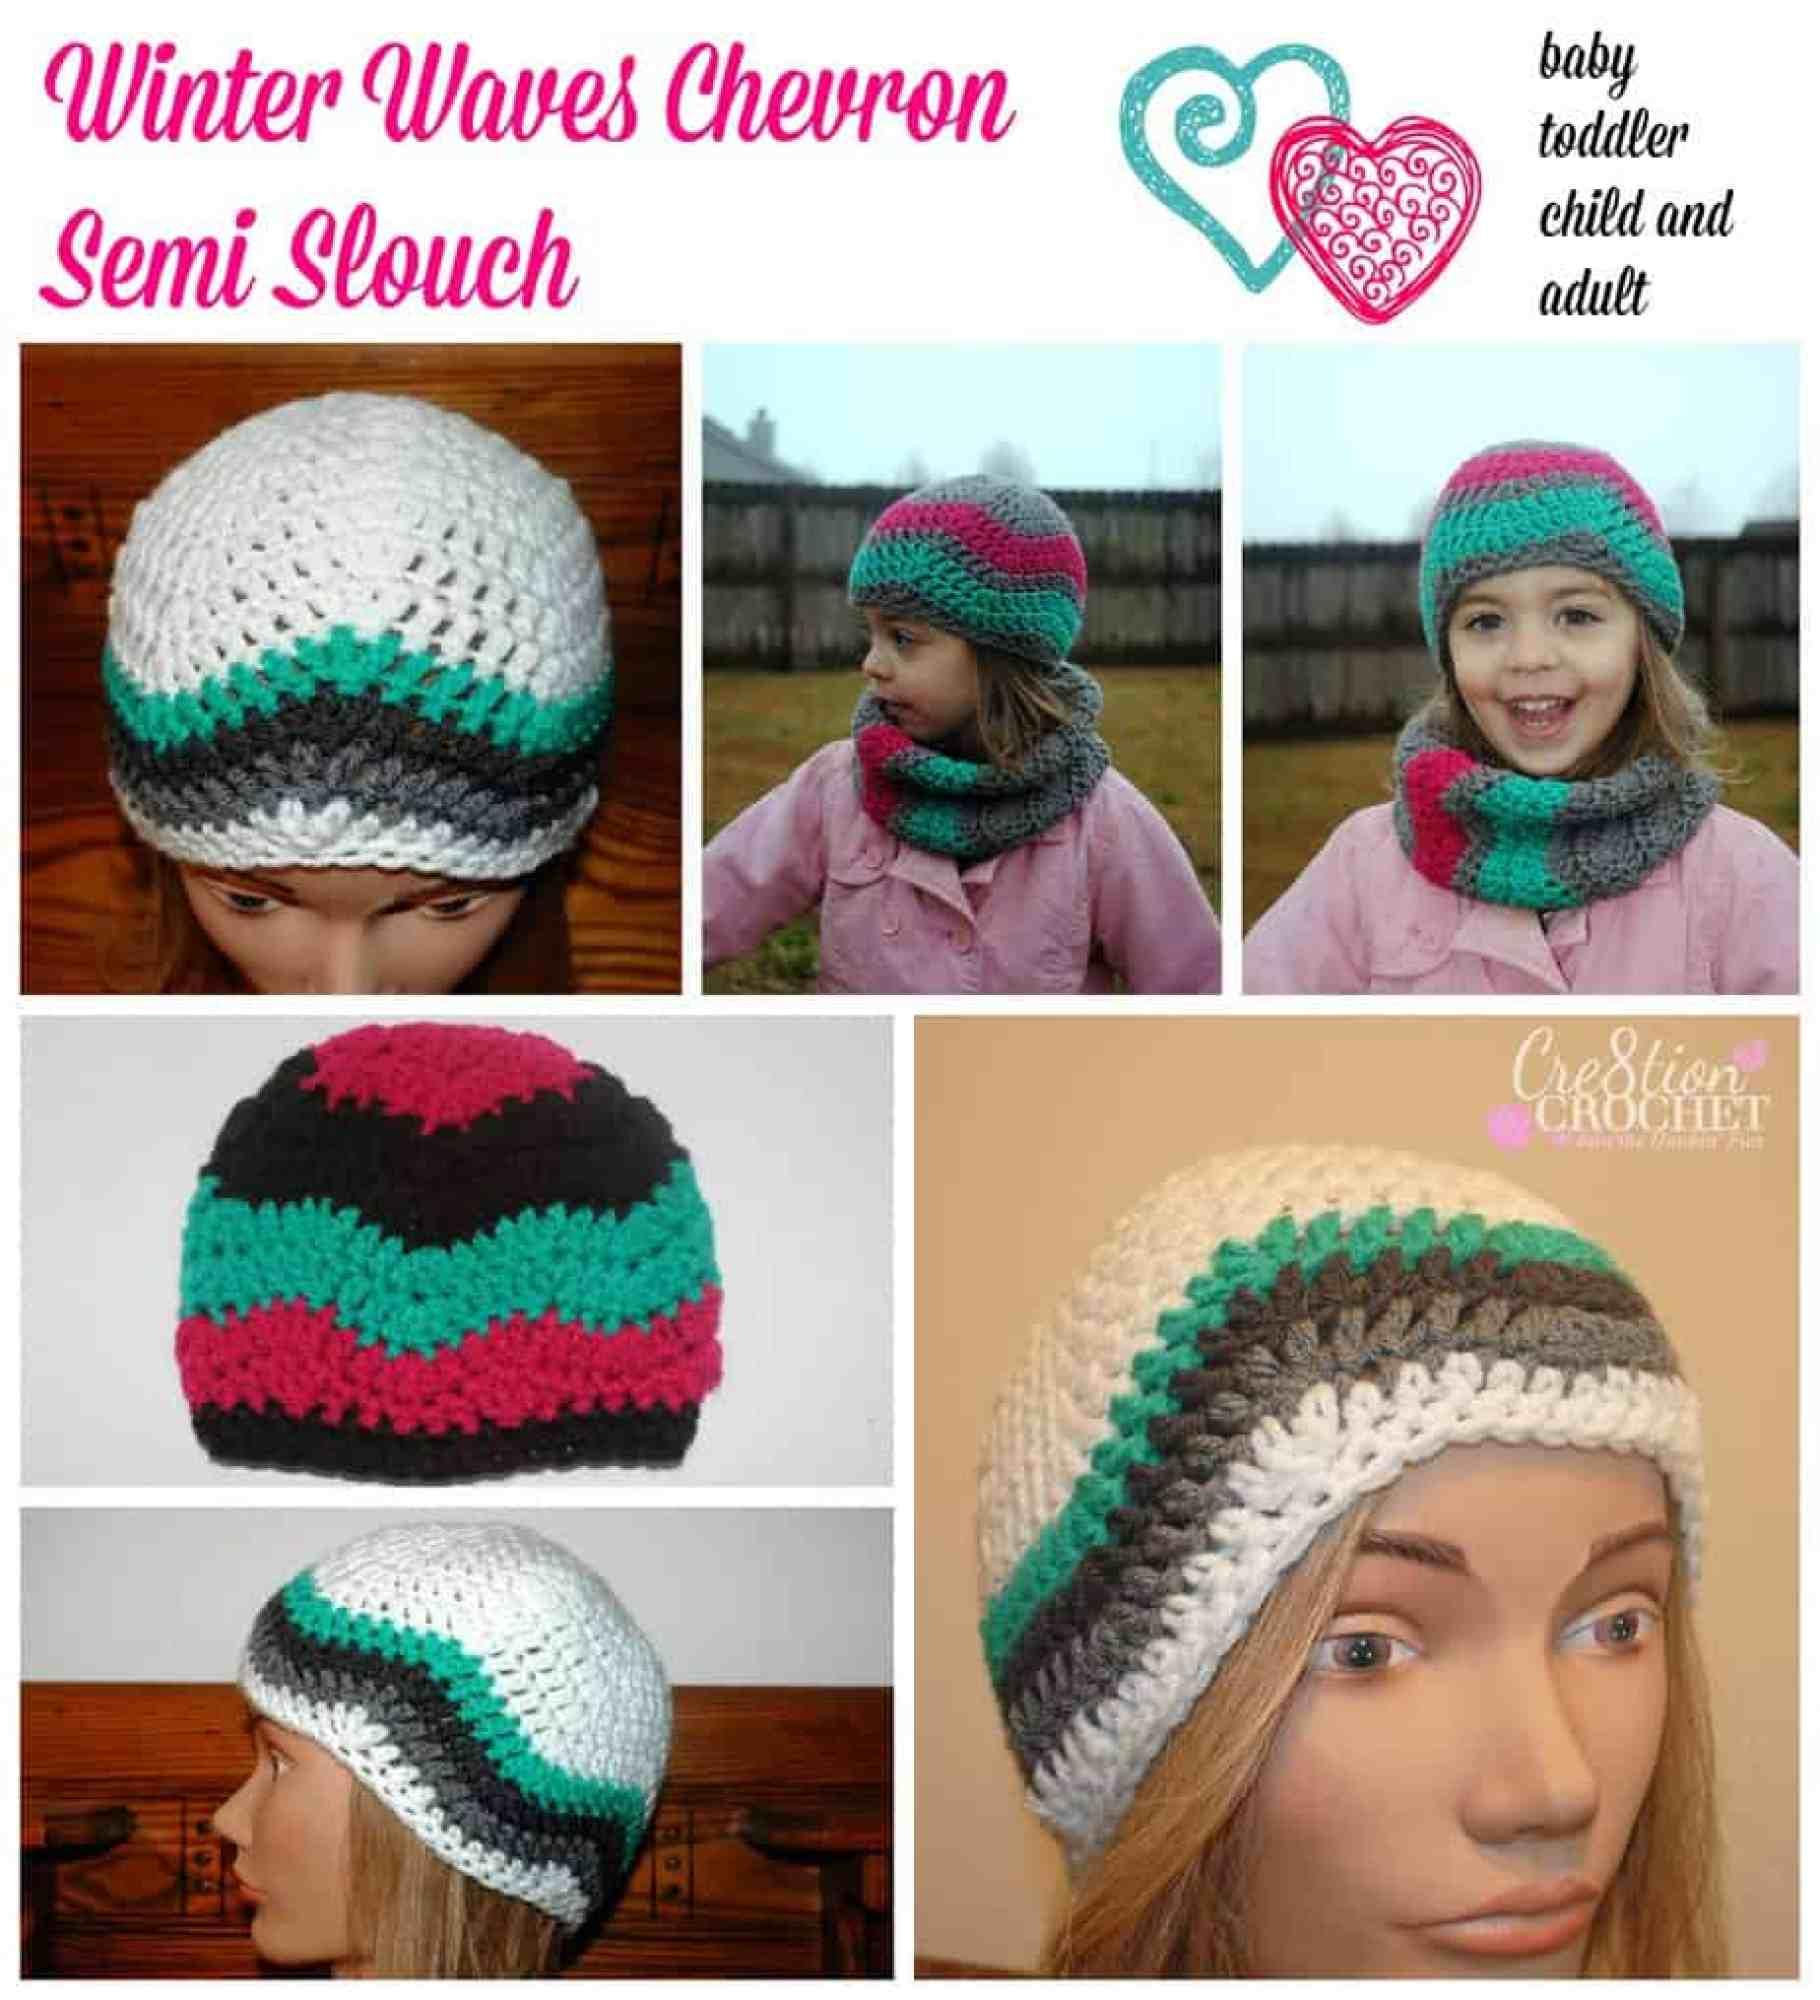 Winter Waves Chevron Cowl And Beanie Free Crochet Pattern Crochetkim